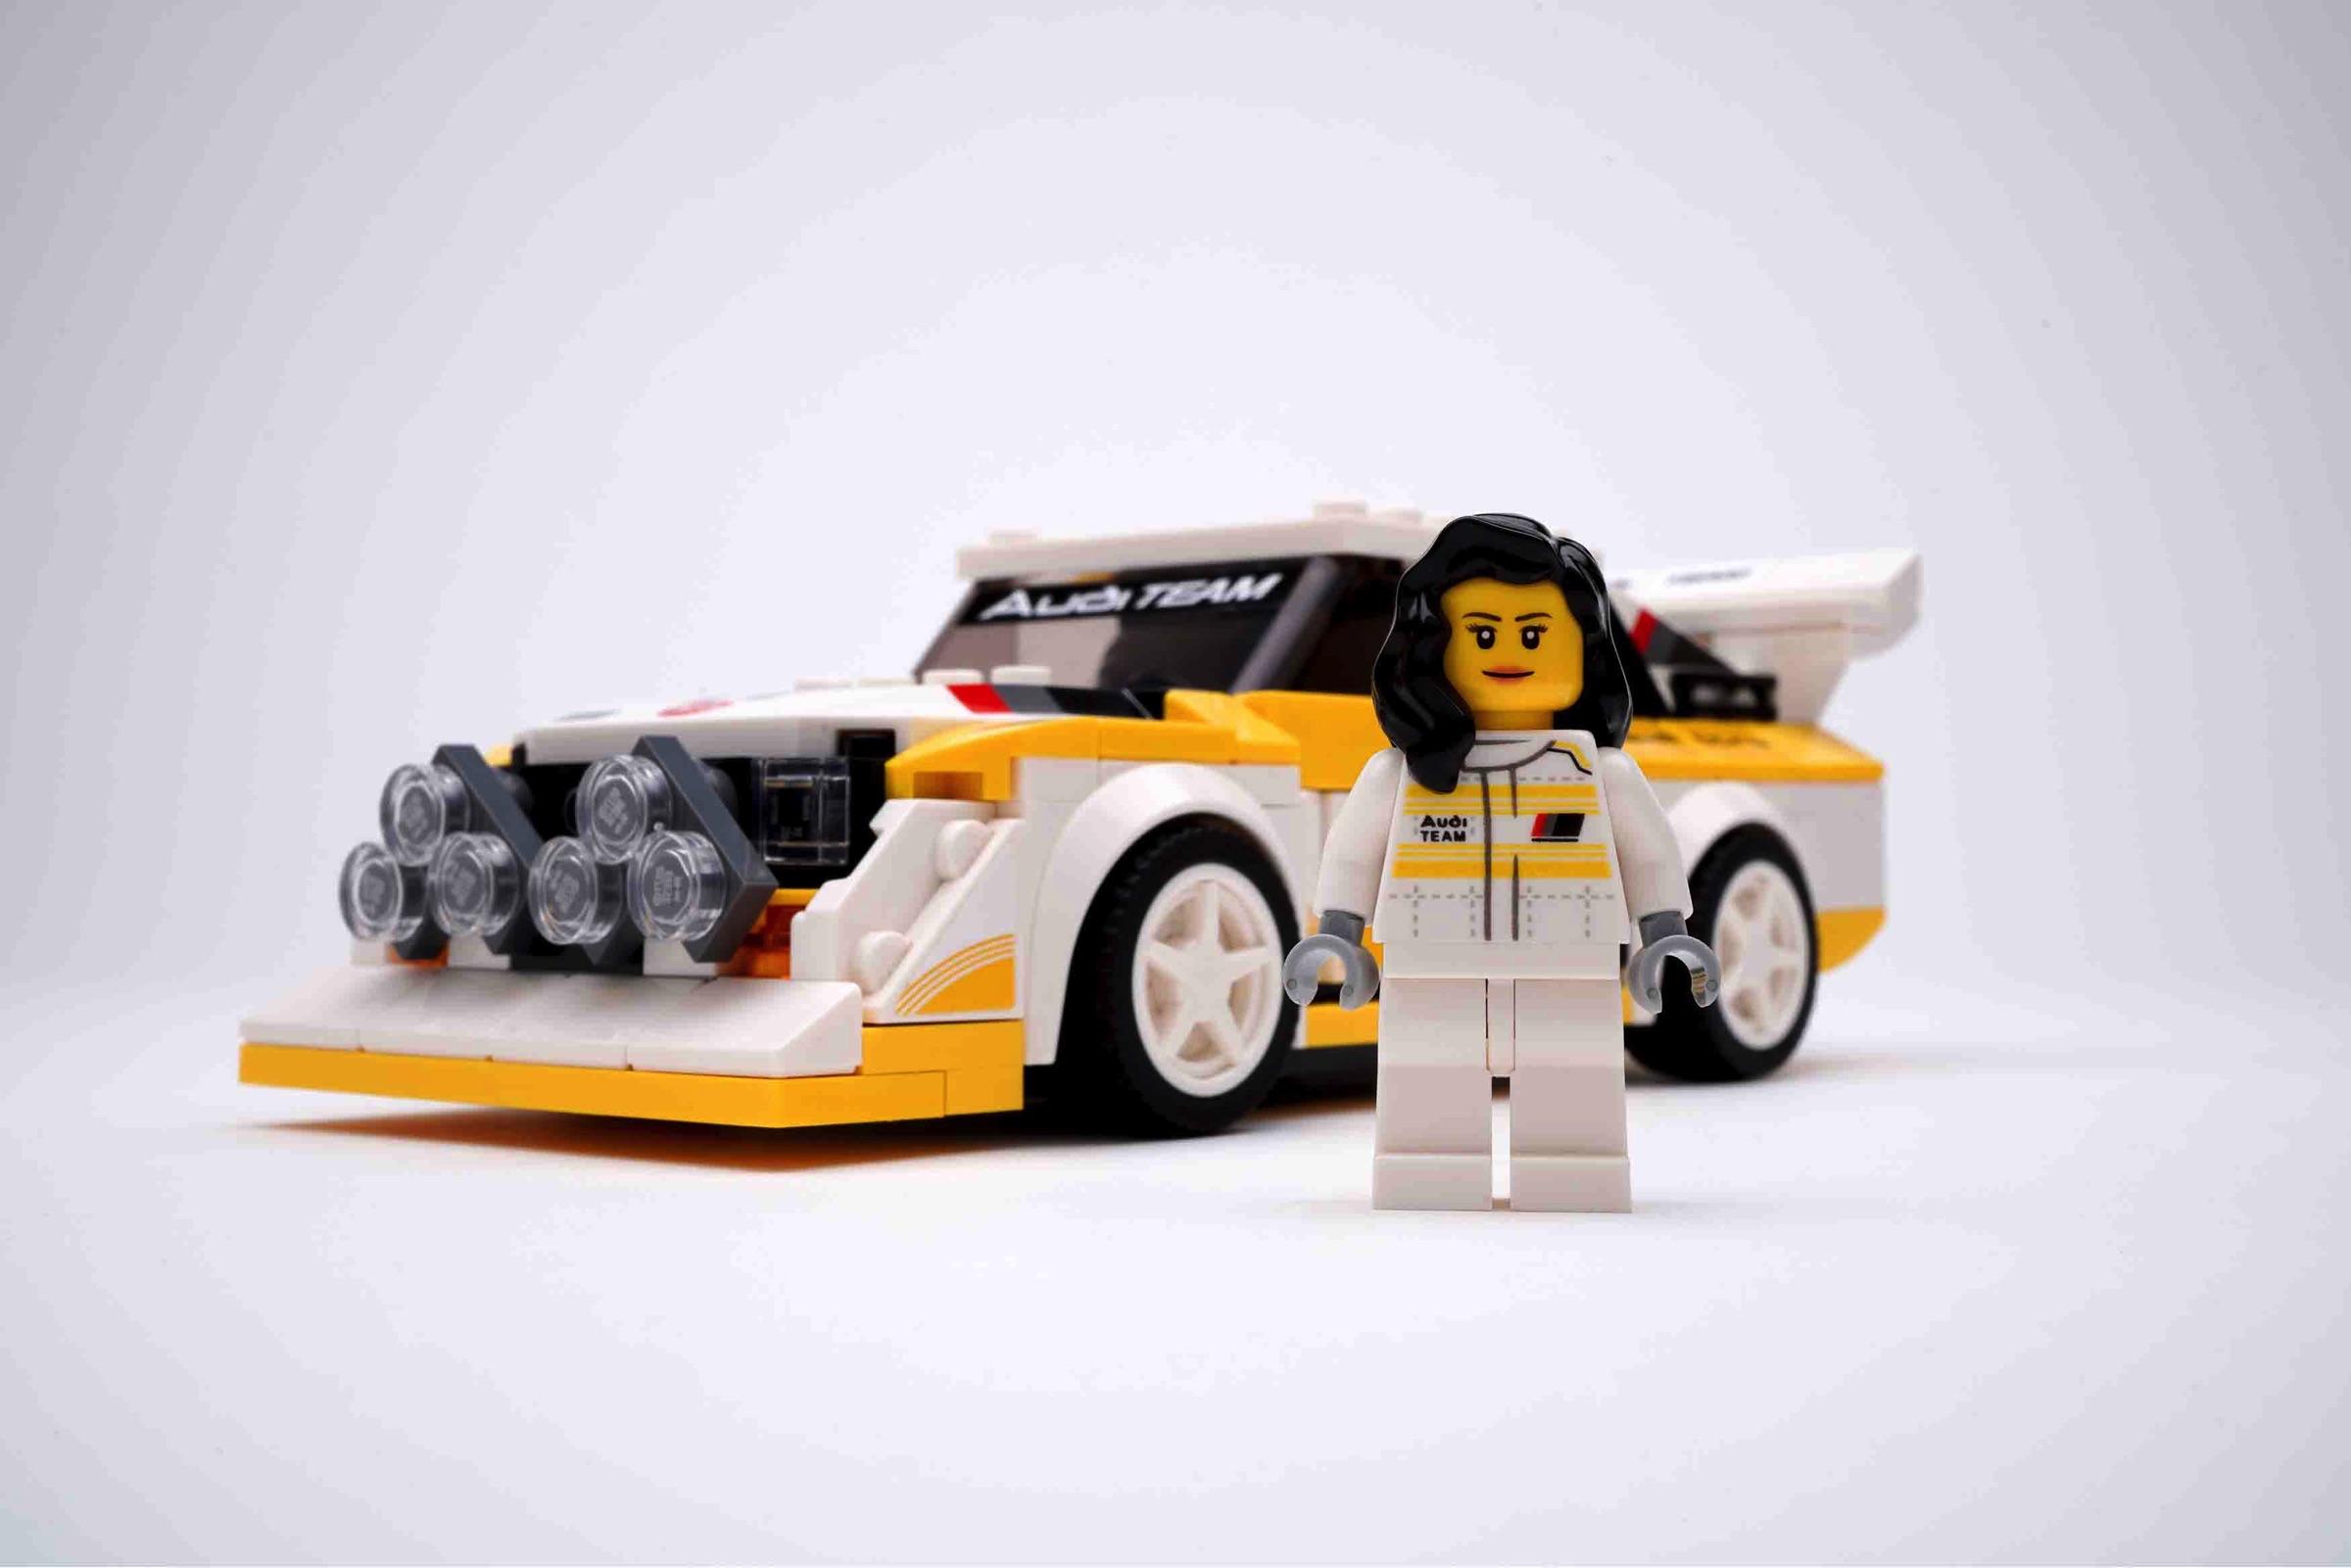 Lego Audi S1